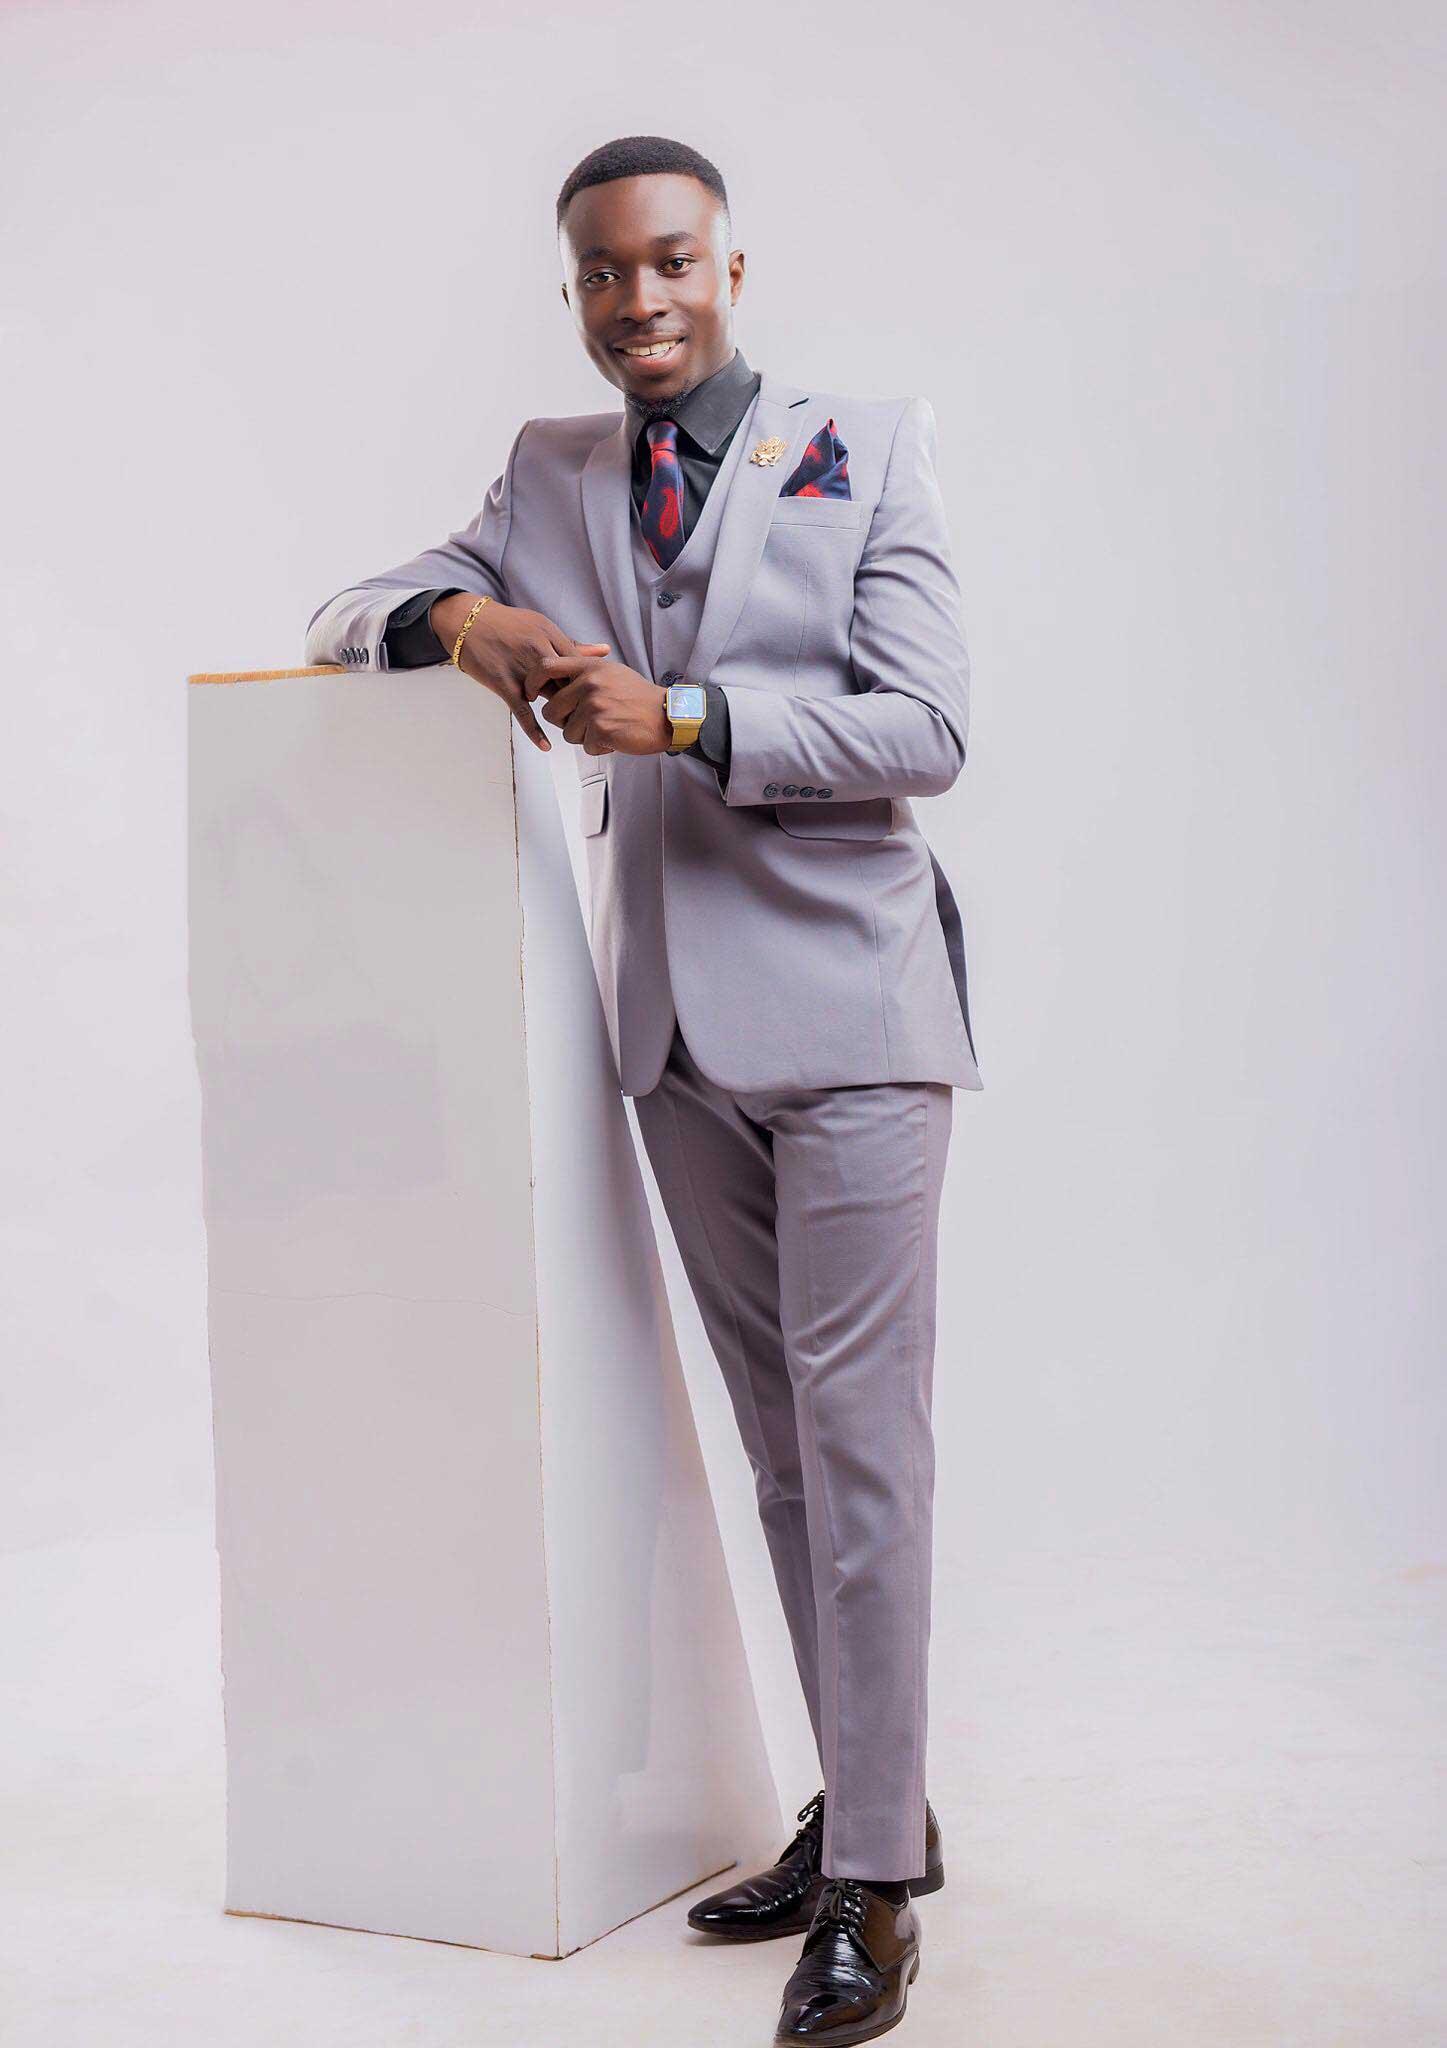 Nana Adu Berchie 1 - I saw Mcbrown's daughter die in her arms-Owusu Bempah's Jnr pastor